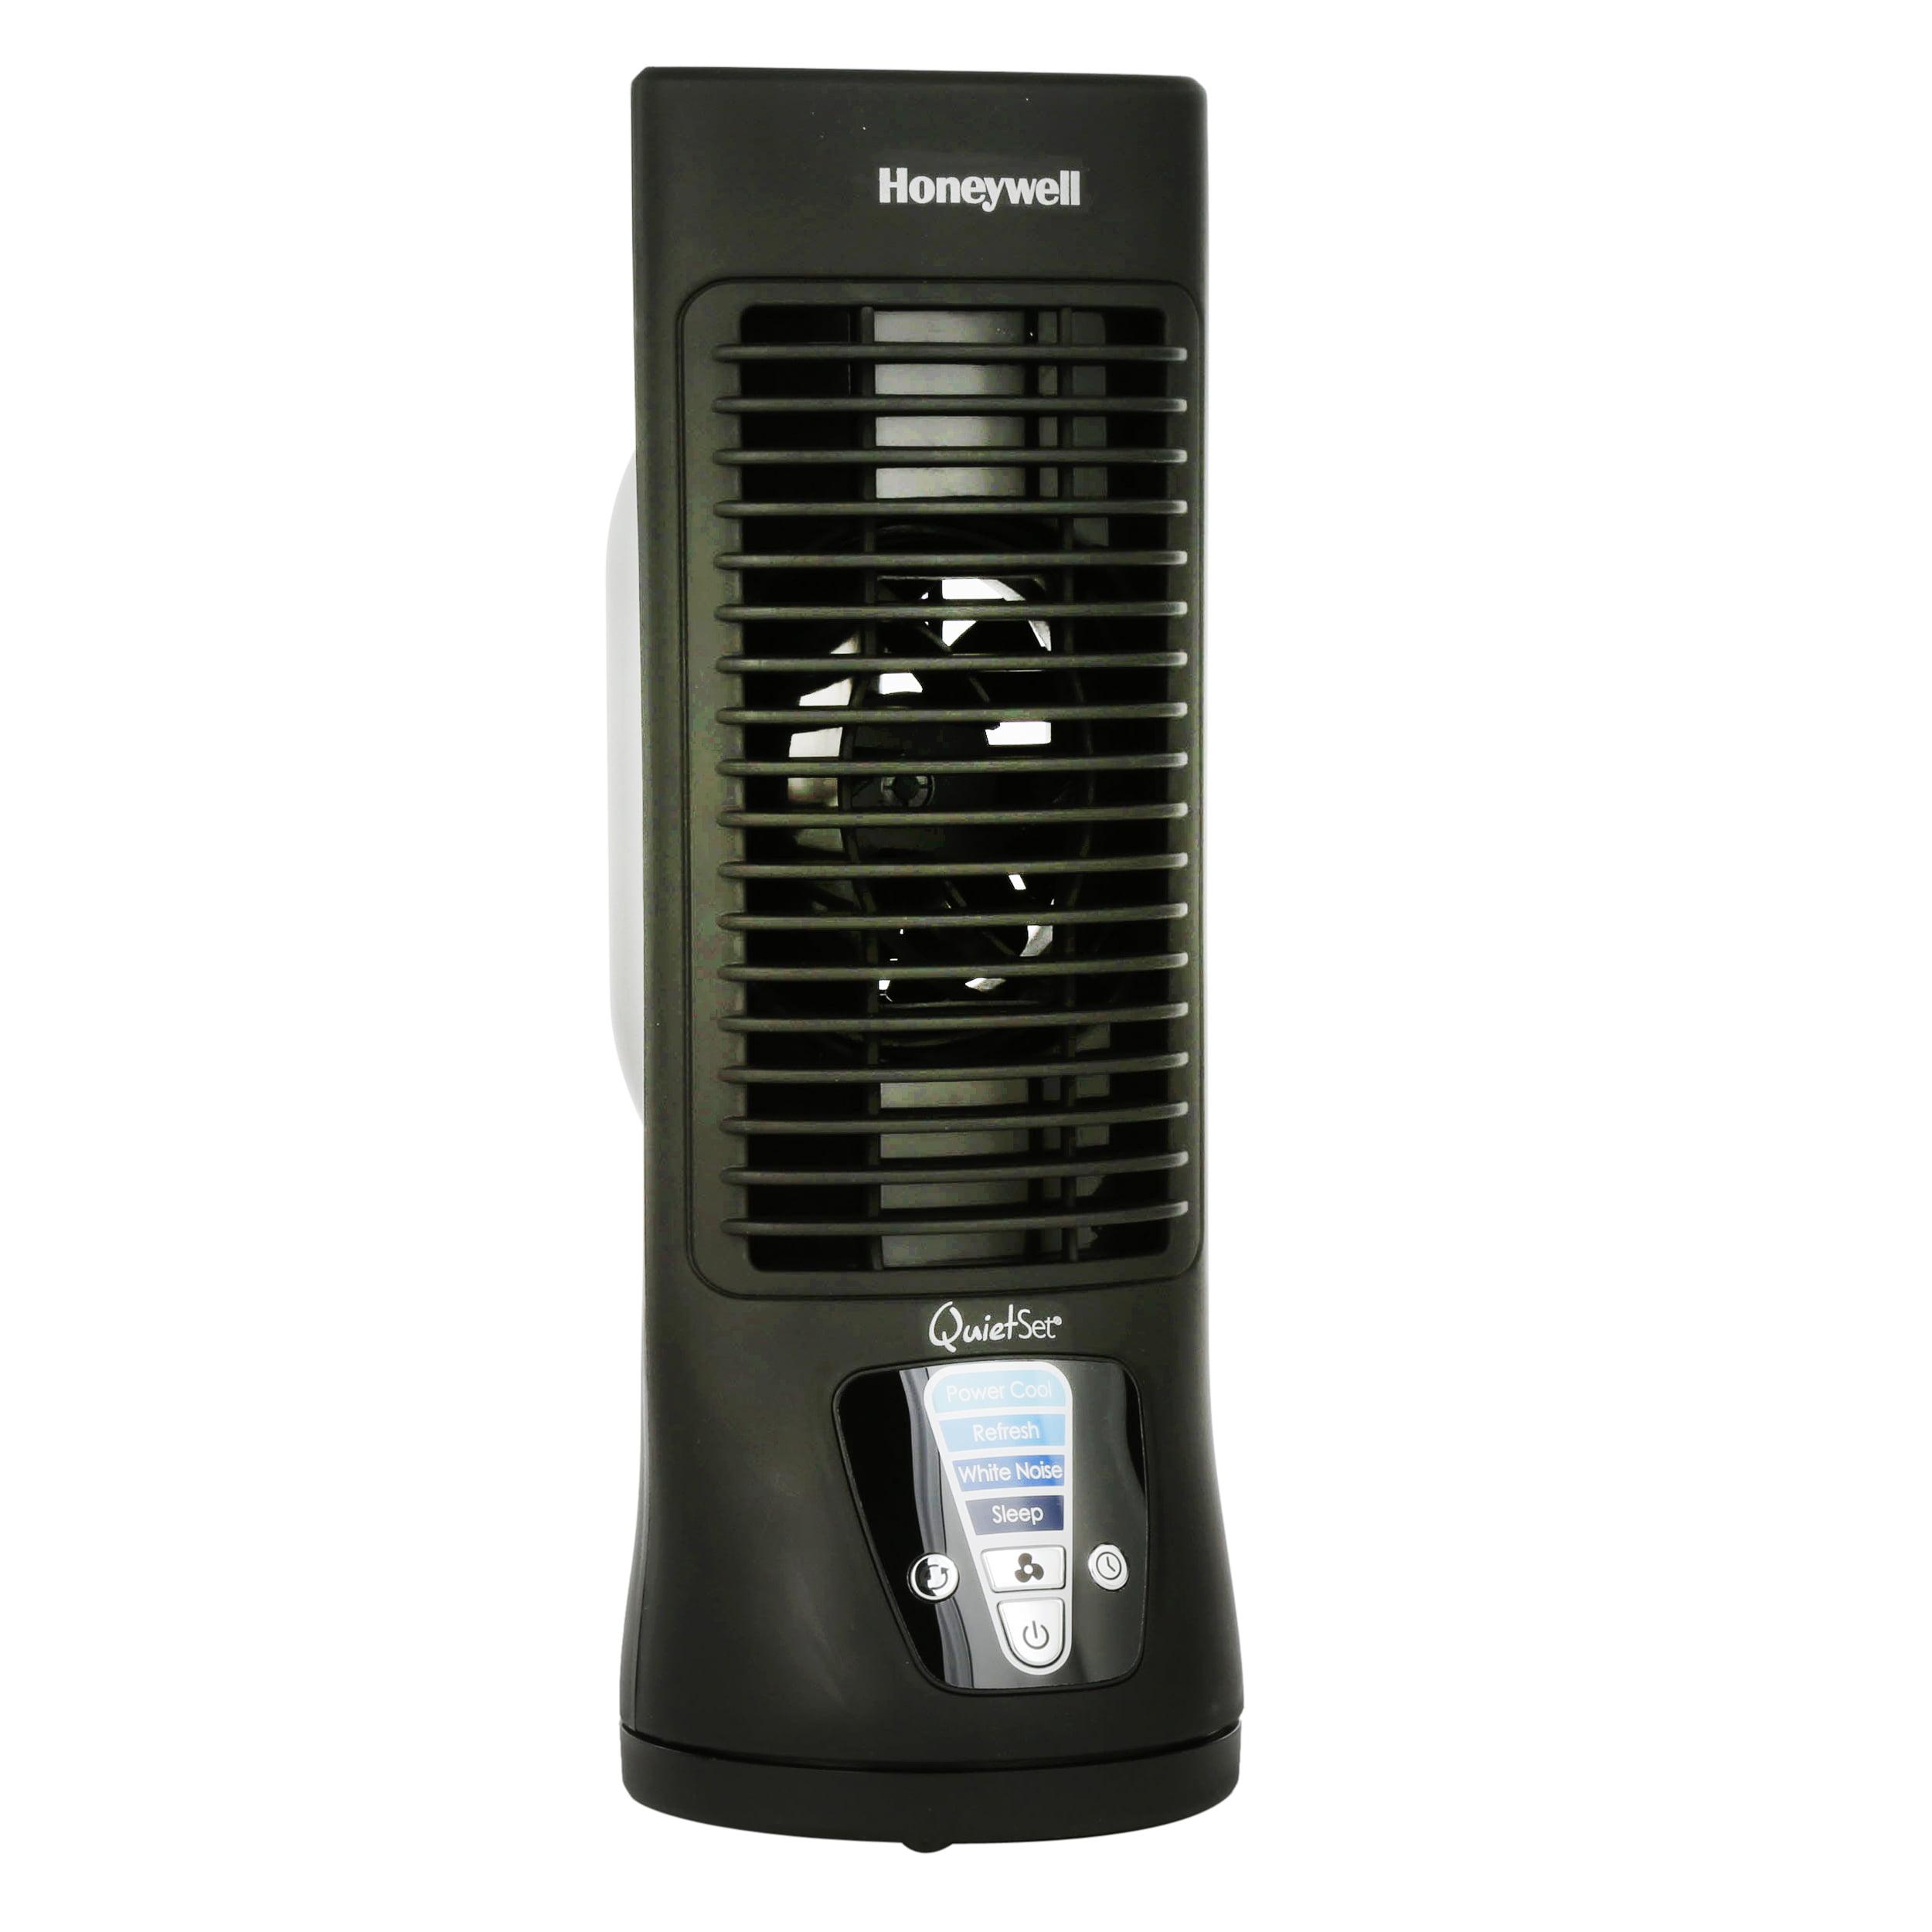 Honeywell QuietSet Slim Mini Tower Fan, HTF210B, Black